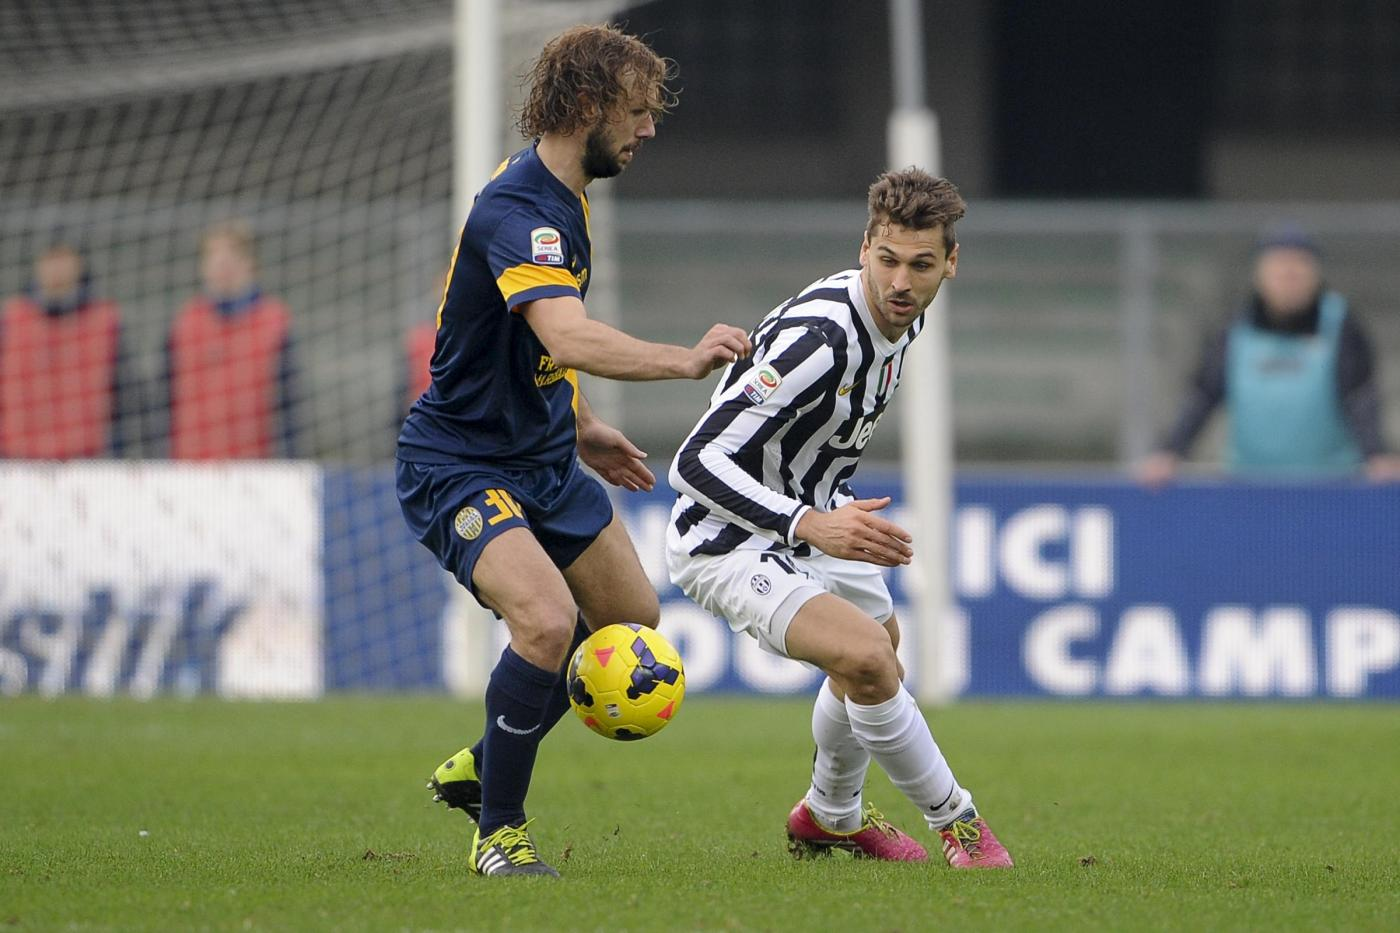 Coppa Italia, la Juventus sommerge il Verona per 6-1